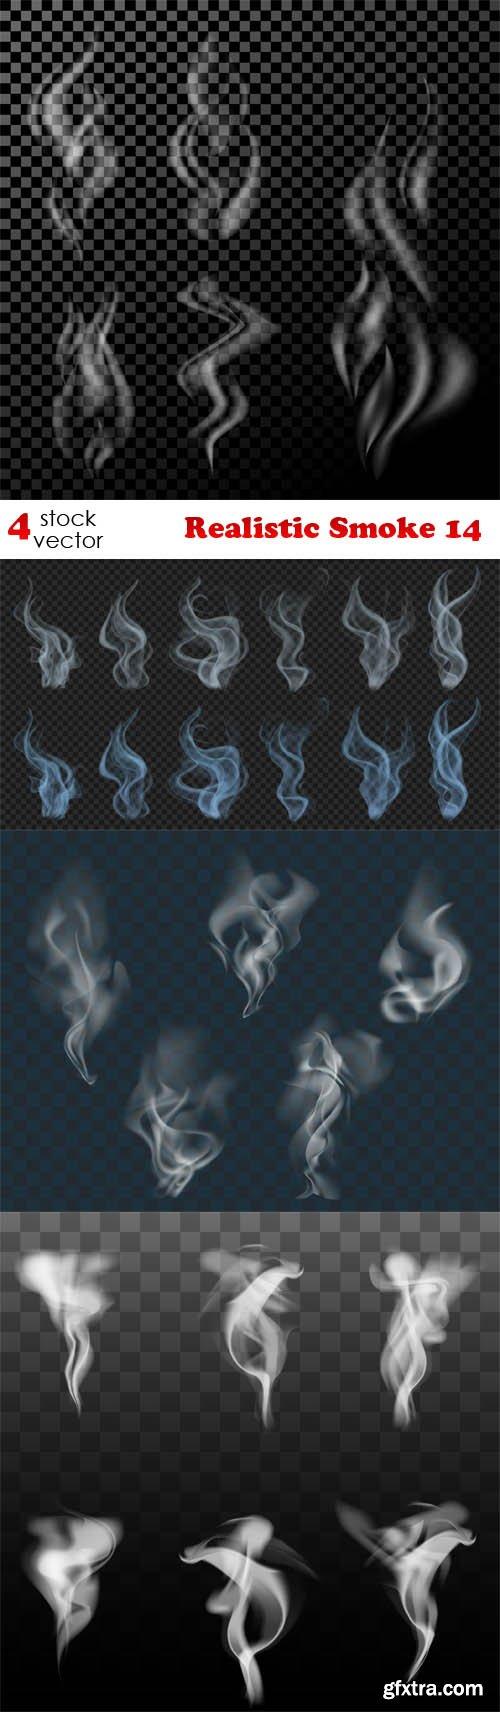 Vectors - Realistic Smoke 14